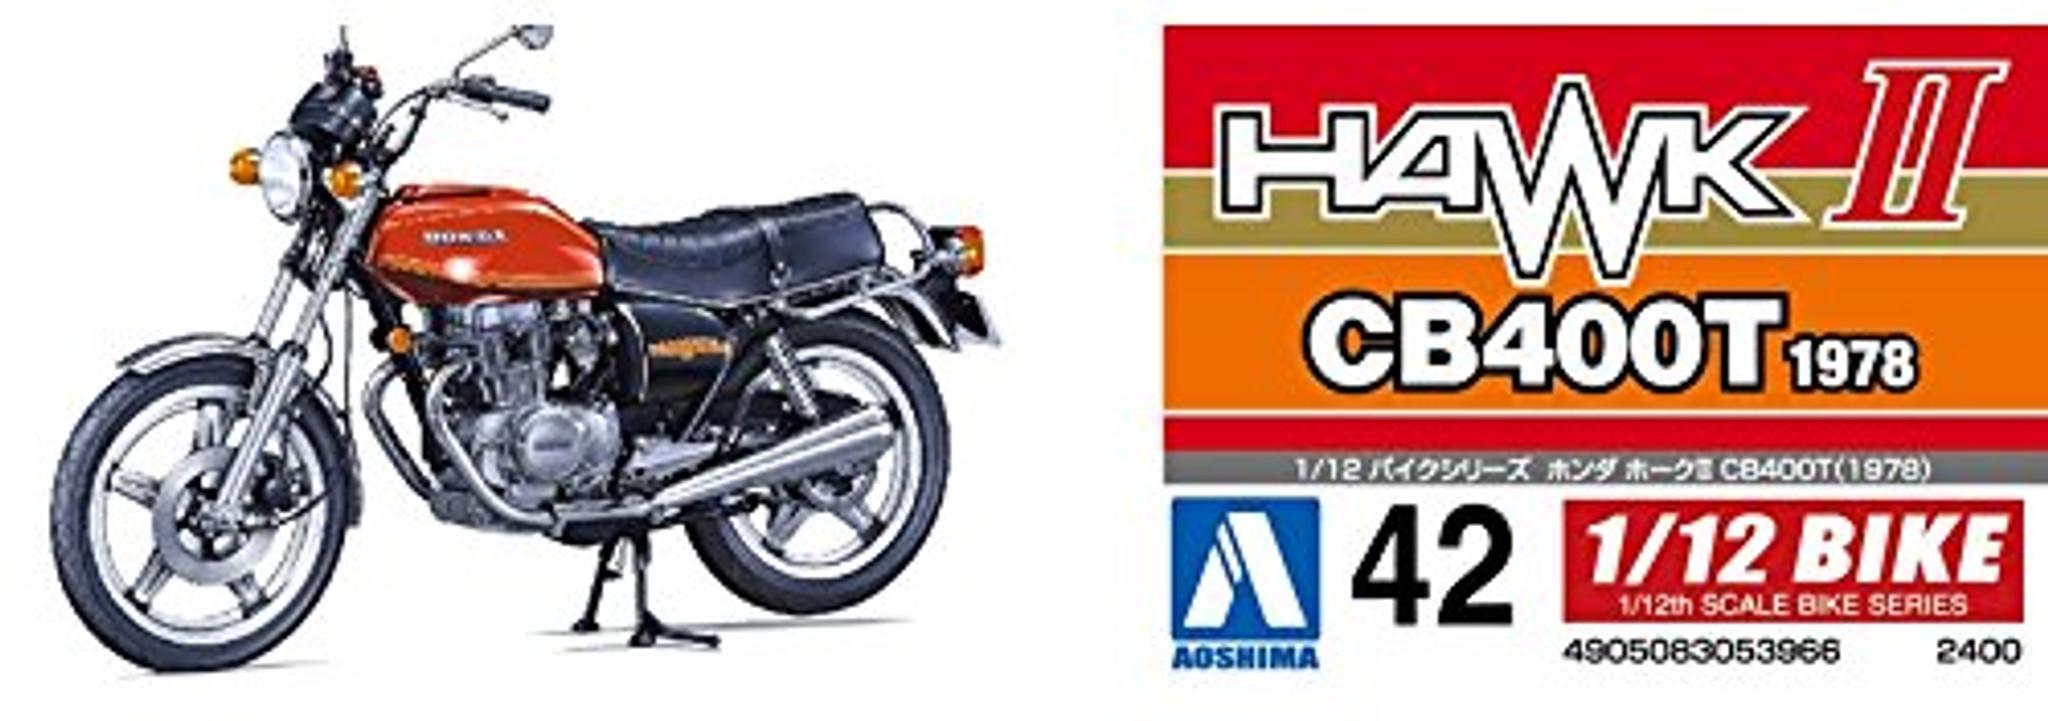 hight resolution of  aoshima 53966 bike 42 honda hawk ii cb400t 1 12 scale kit